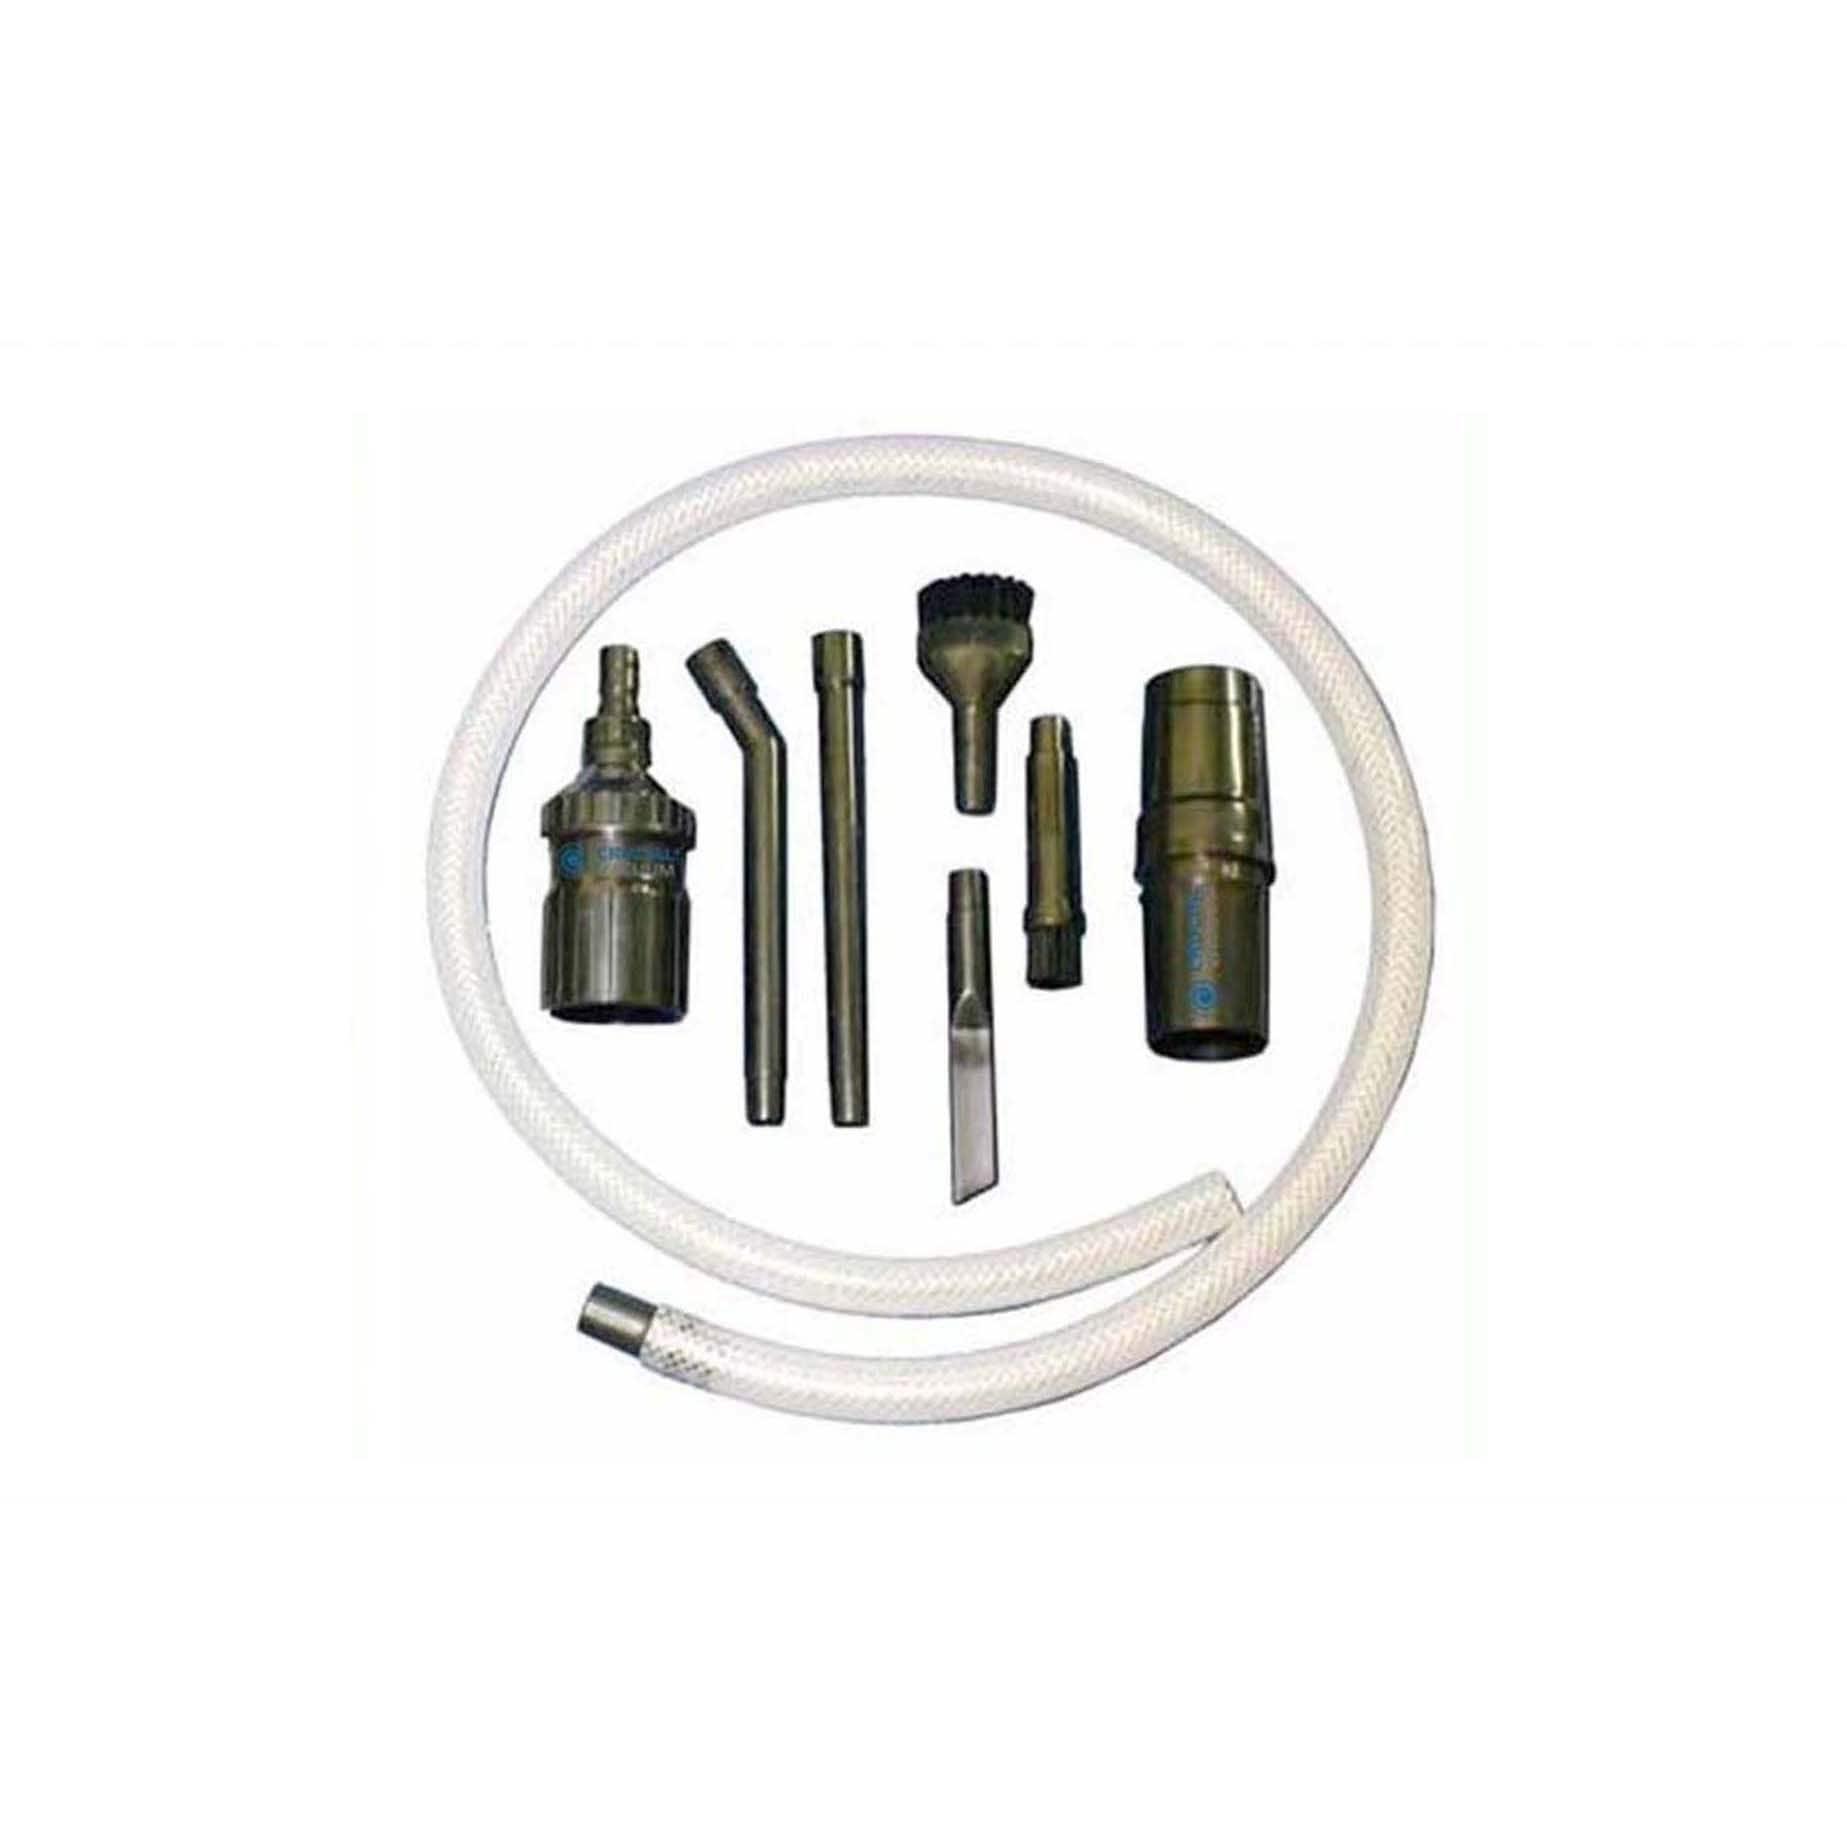 Crucial Mini Micro Tool Attachment Set/ Fits All Vacuum C...